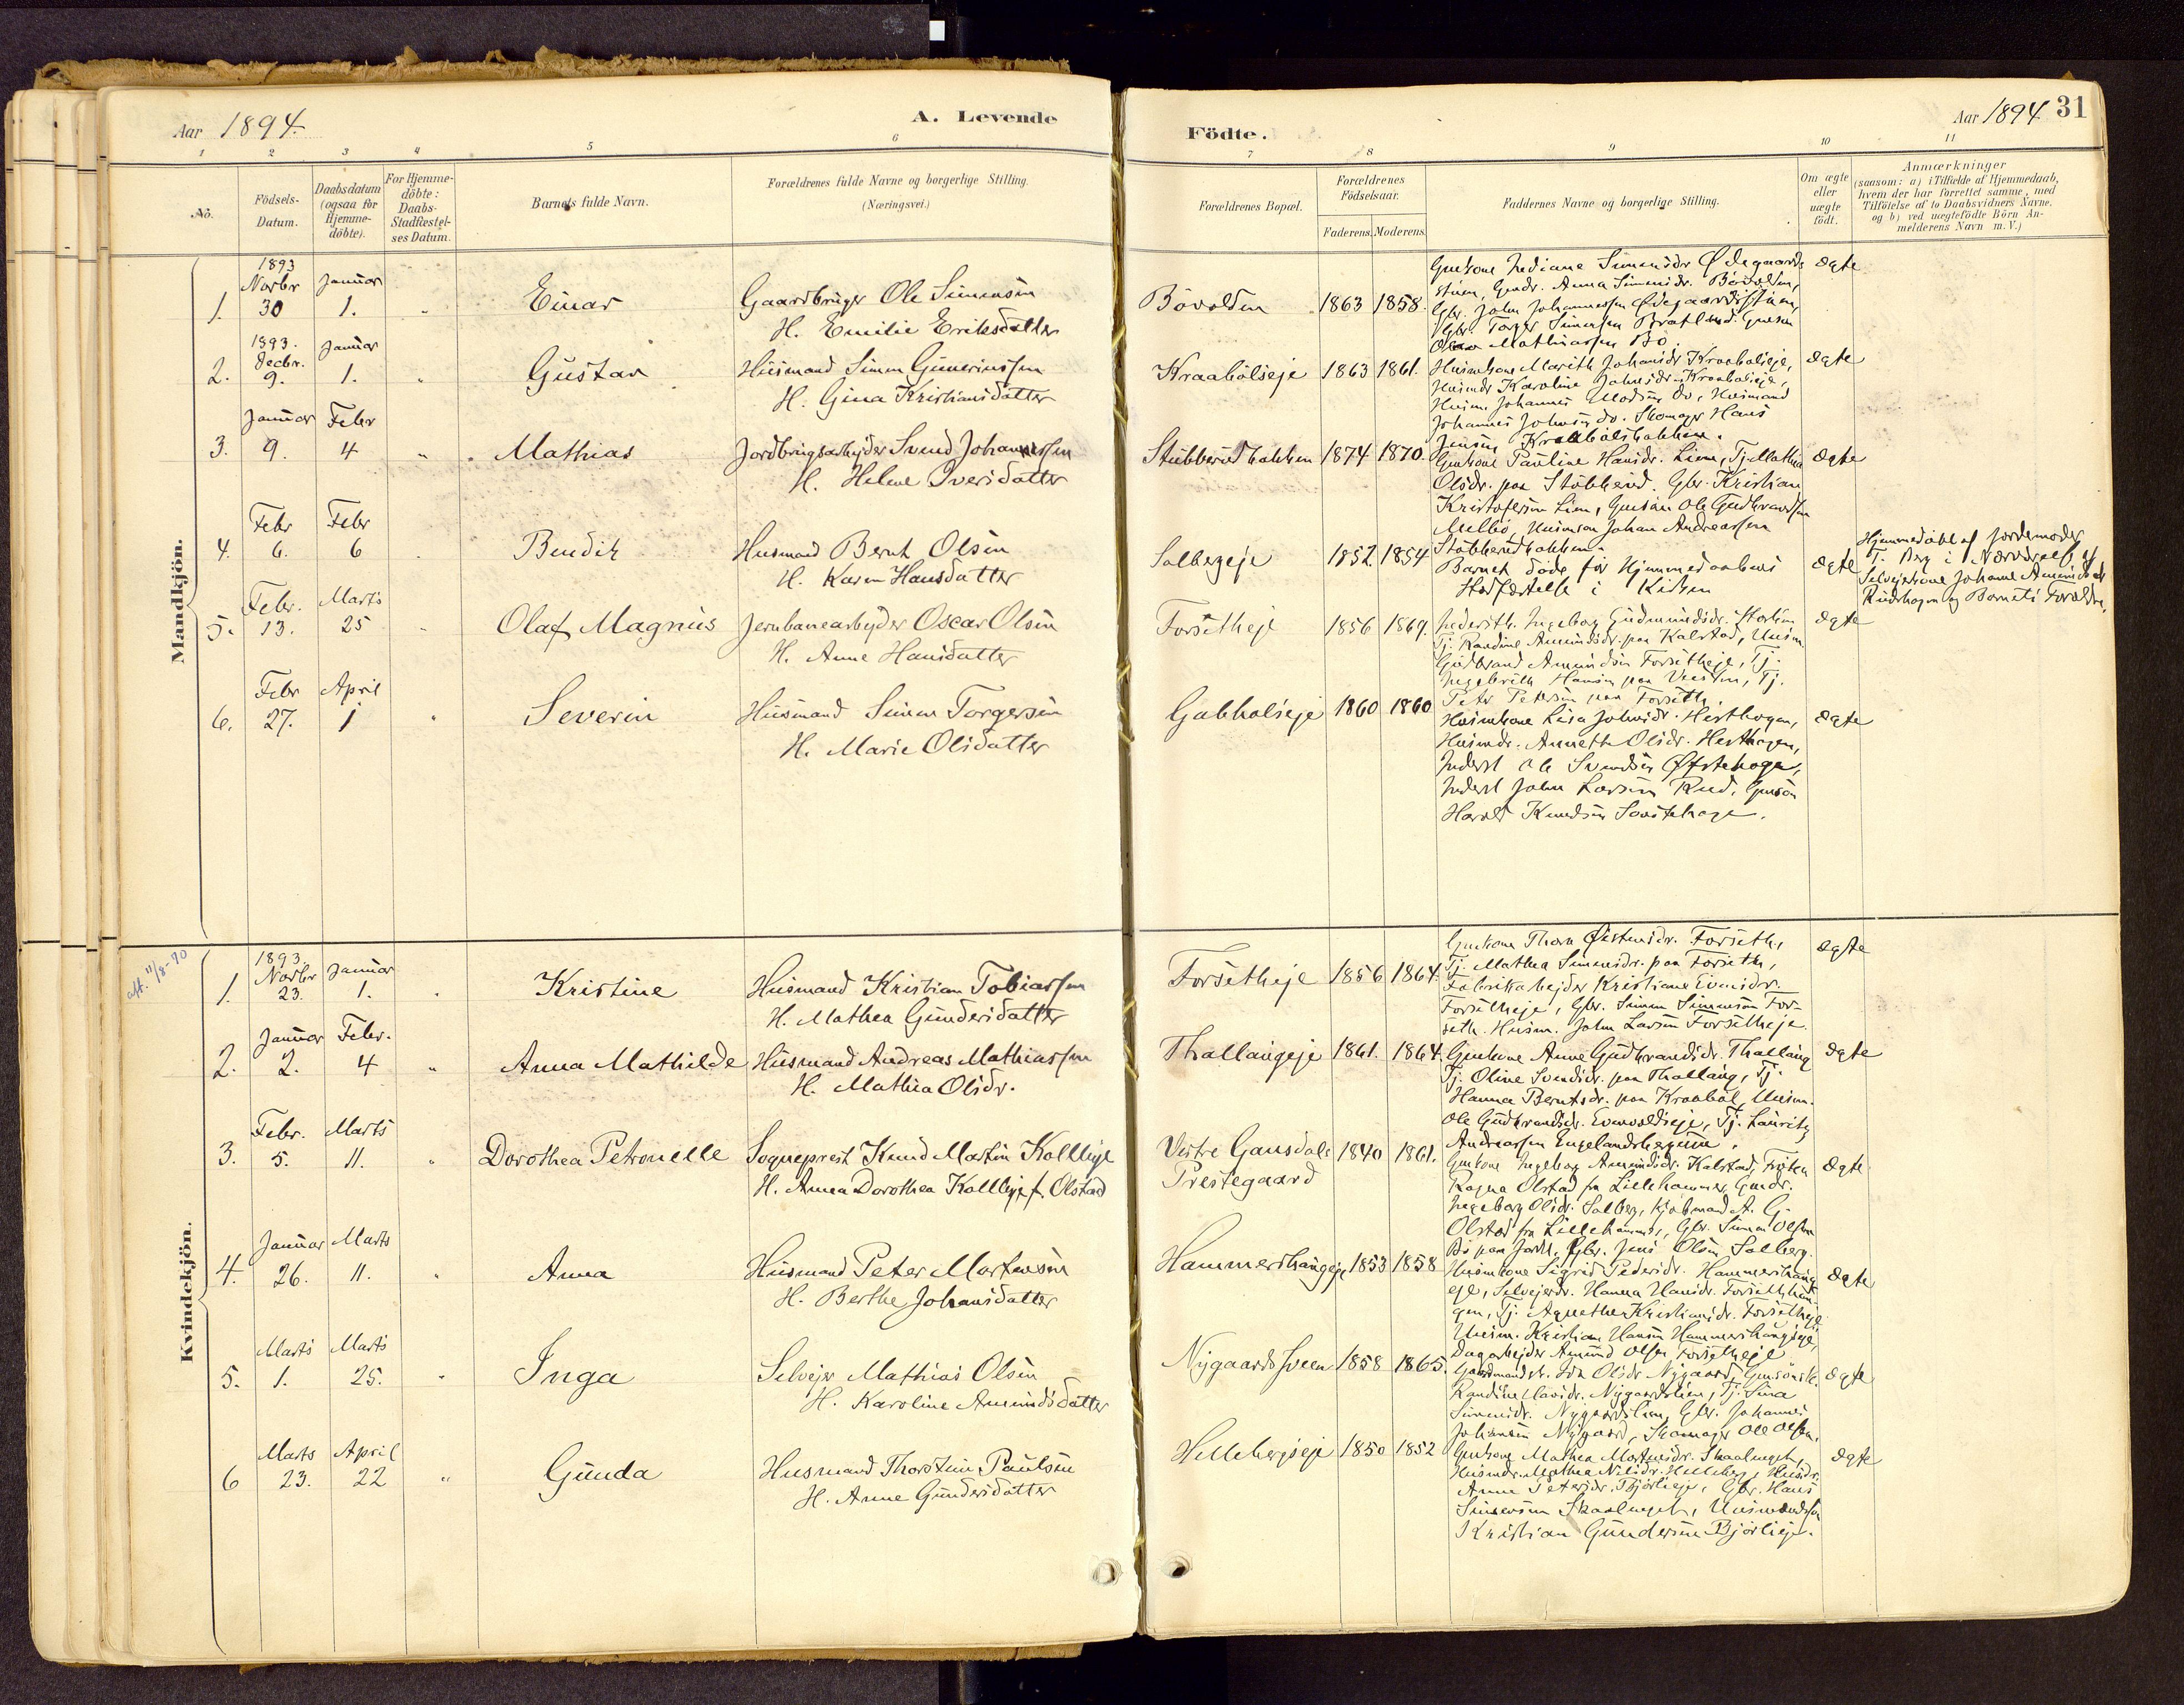 SAH, Vestre Gausdal prestekontor, Ministerialbok nr. 1, 1887-1914, s. 31